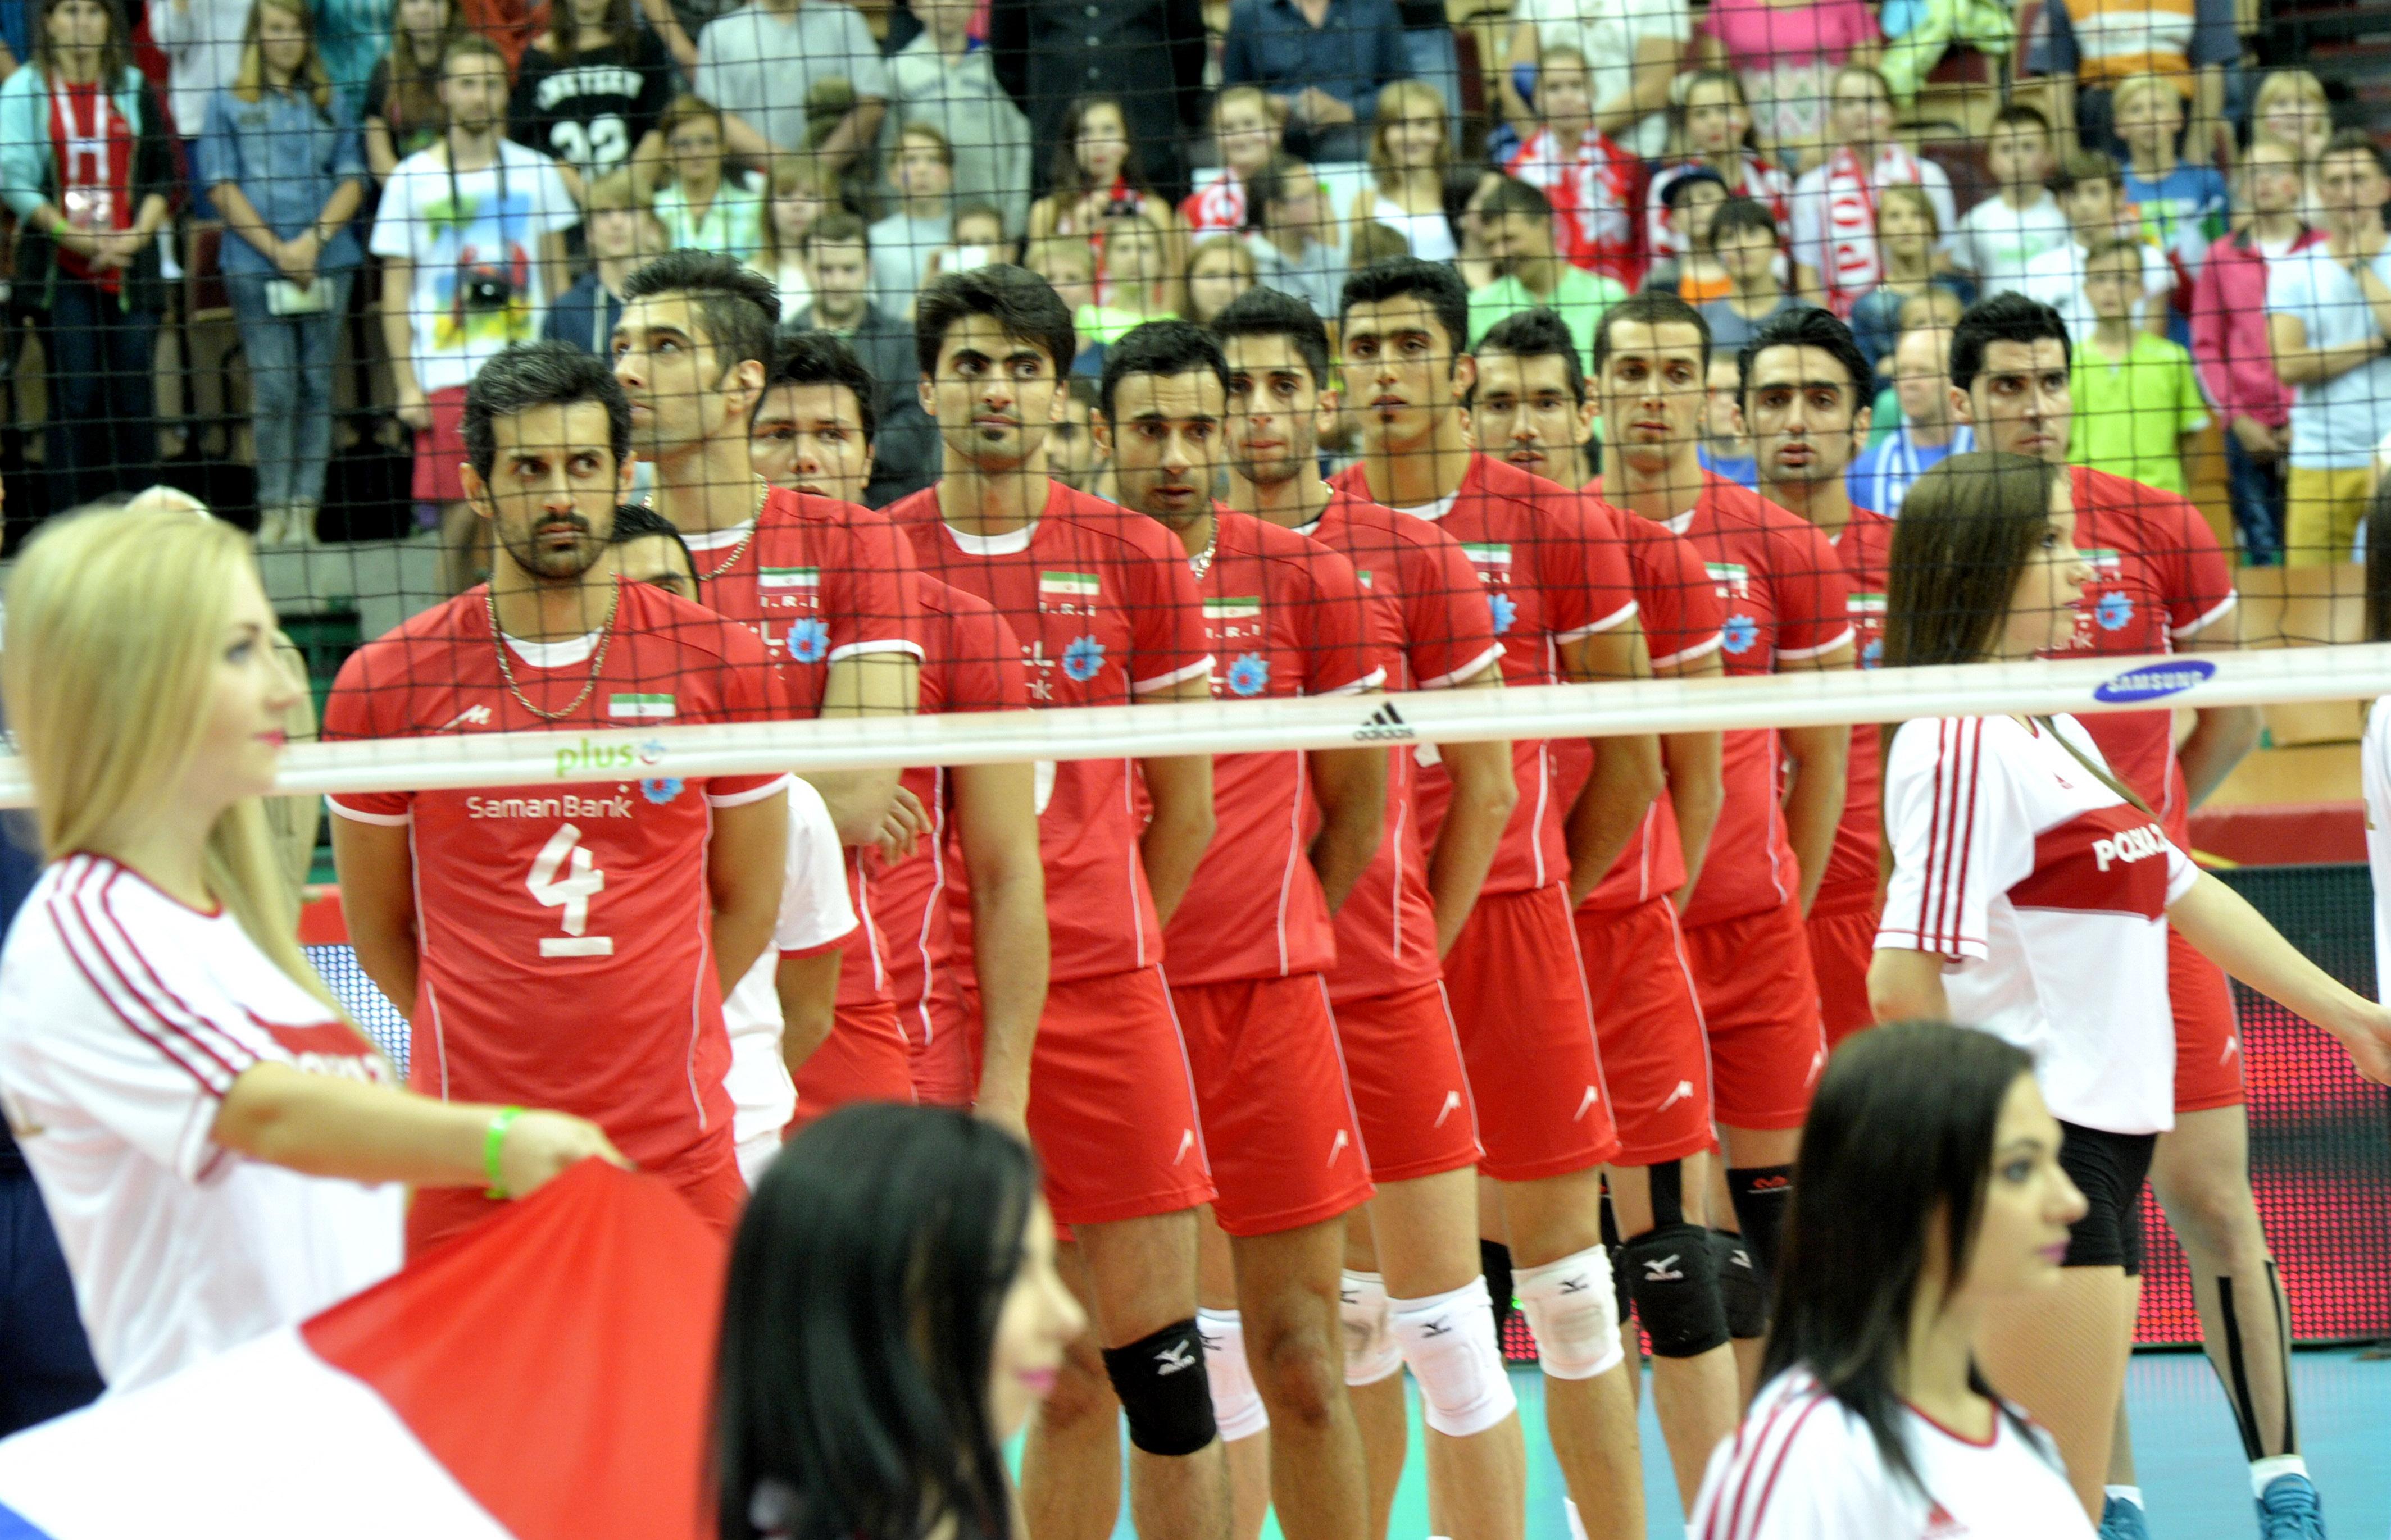 والیبال قهرمانی جهان زن تماشاگر والیبال دختر تماشاگر والیبال تماشاگران والیبال تماشاگران ایرانی